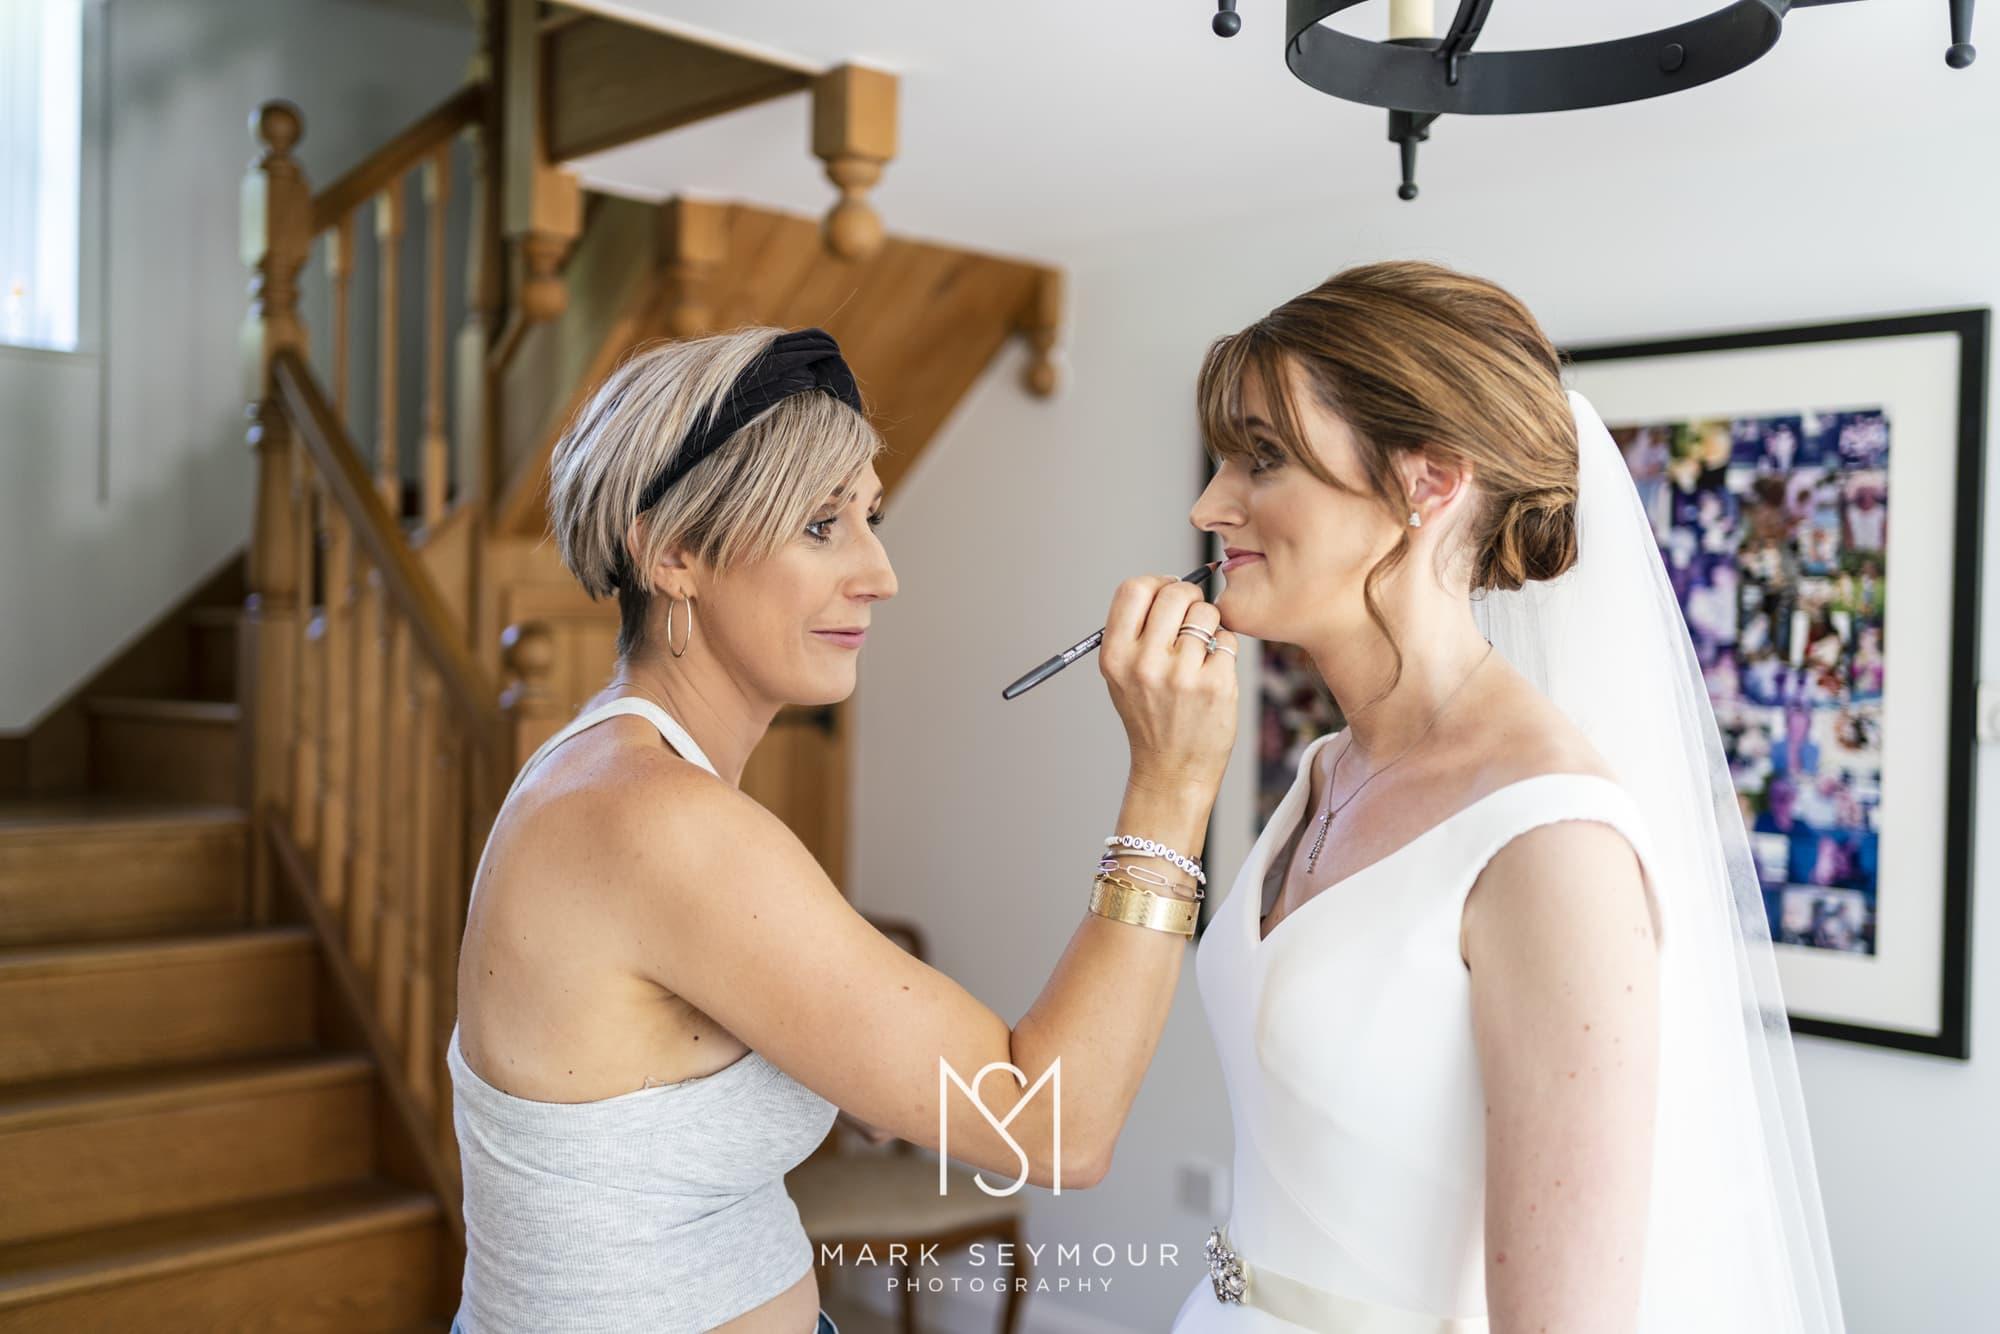 Barnsley House Wedding Photographer - Olivia and James' wedding 3